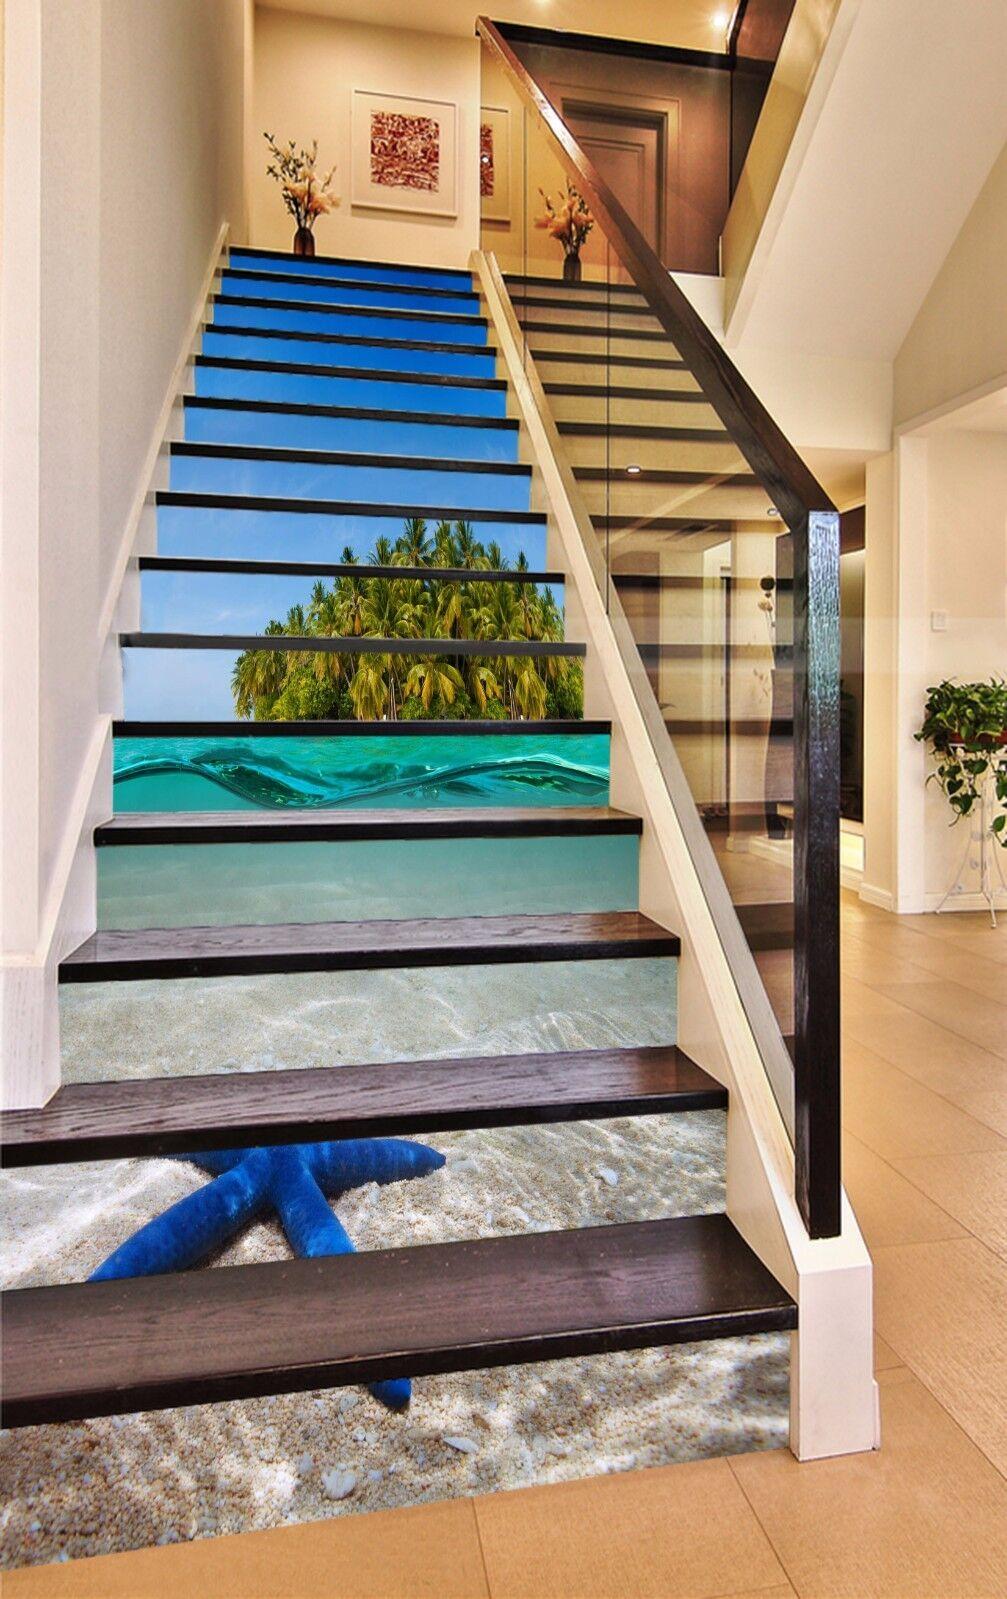 3D Sea Island 764 Stair Risers Decoration Photo Mural Vinyl Decal Wallpaper AU